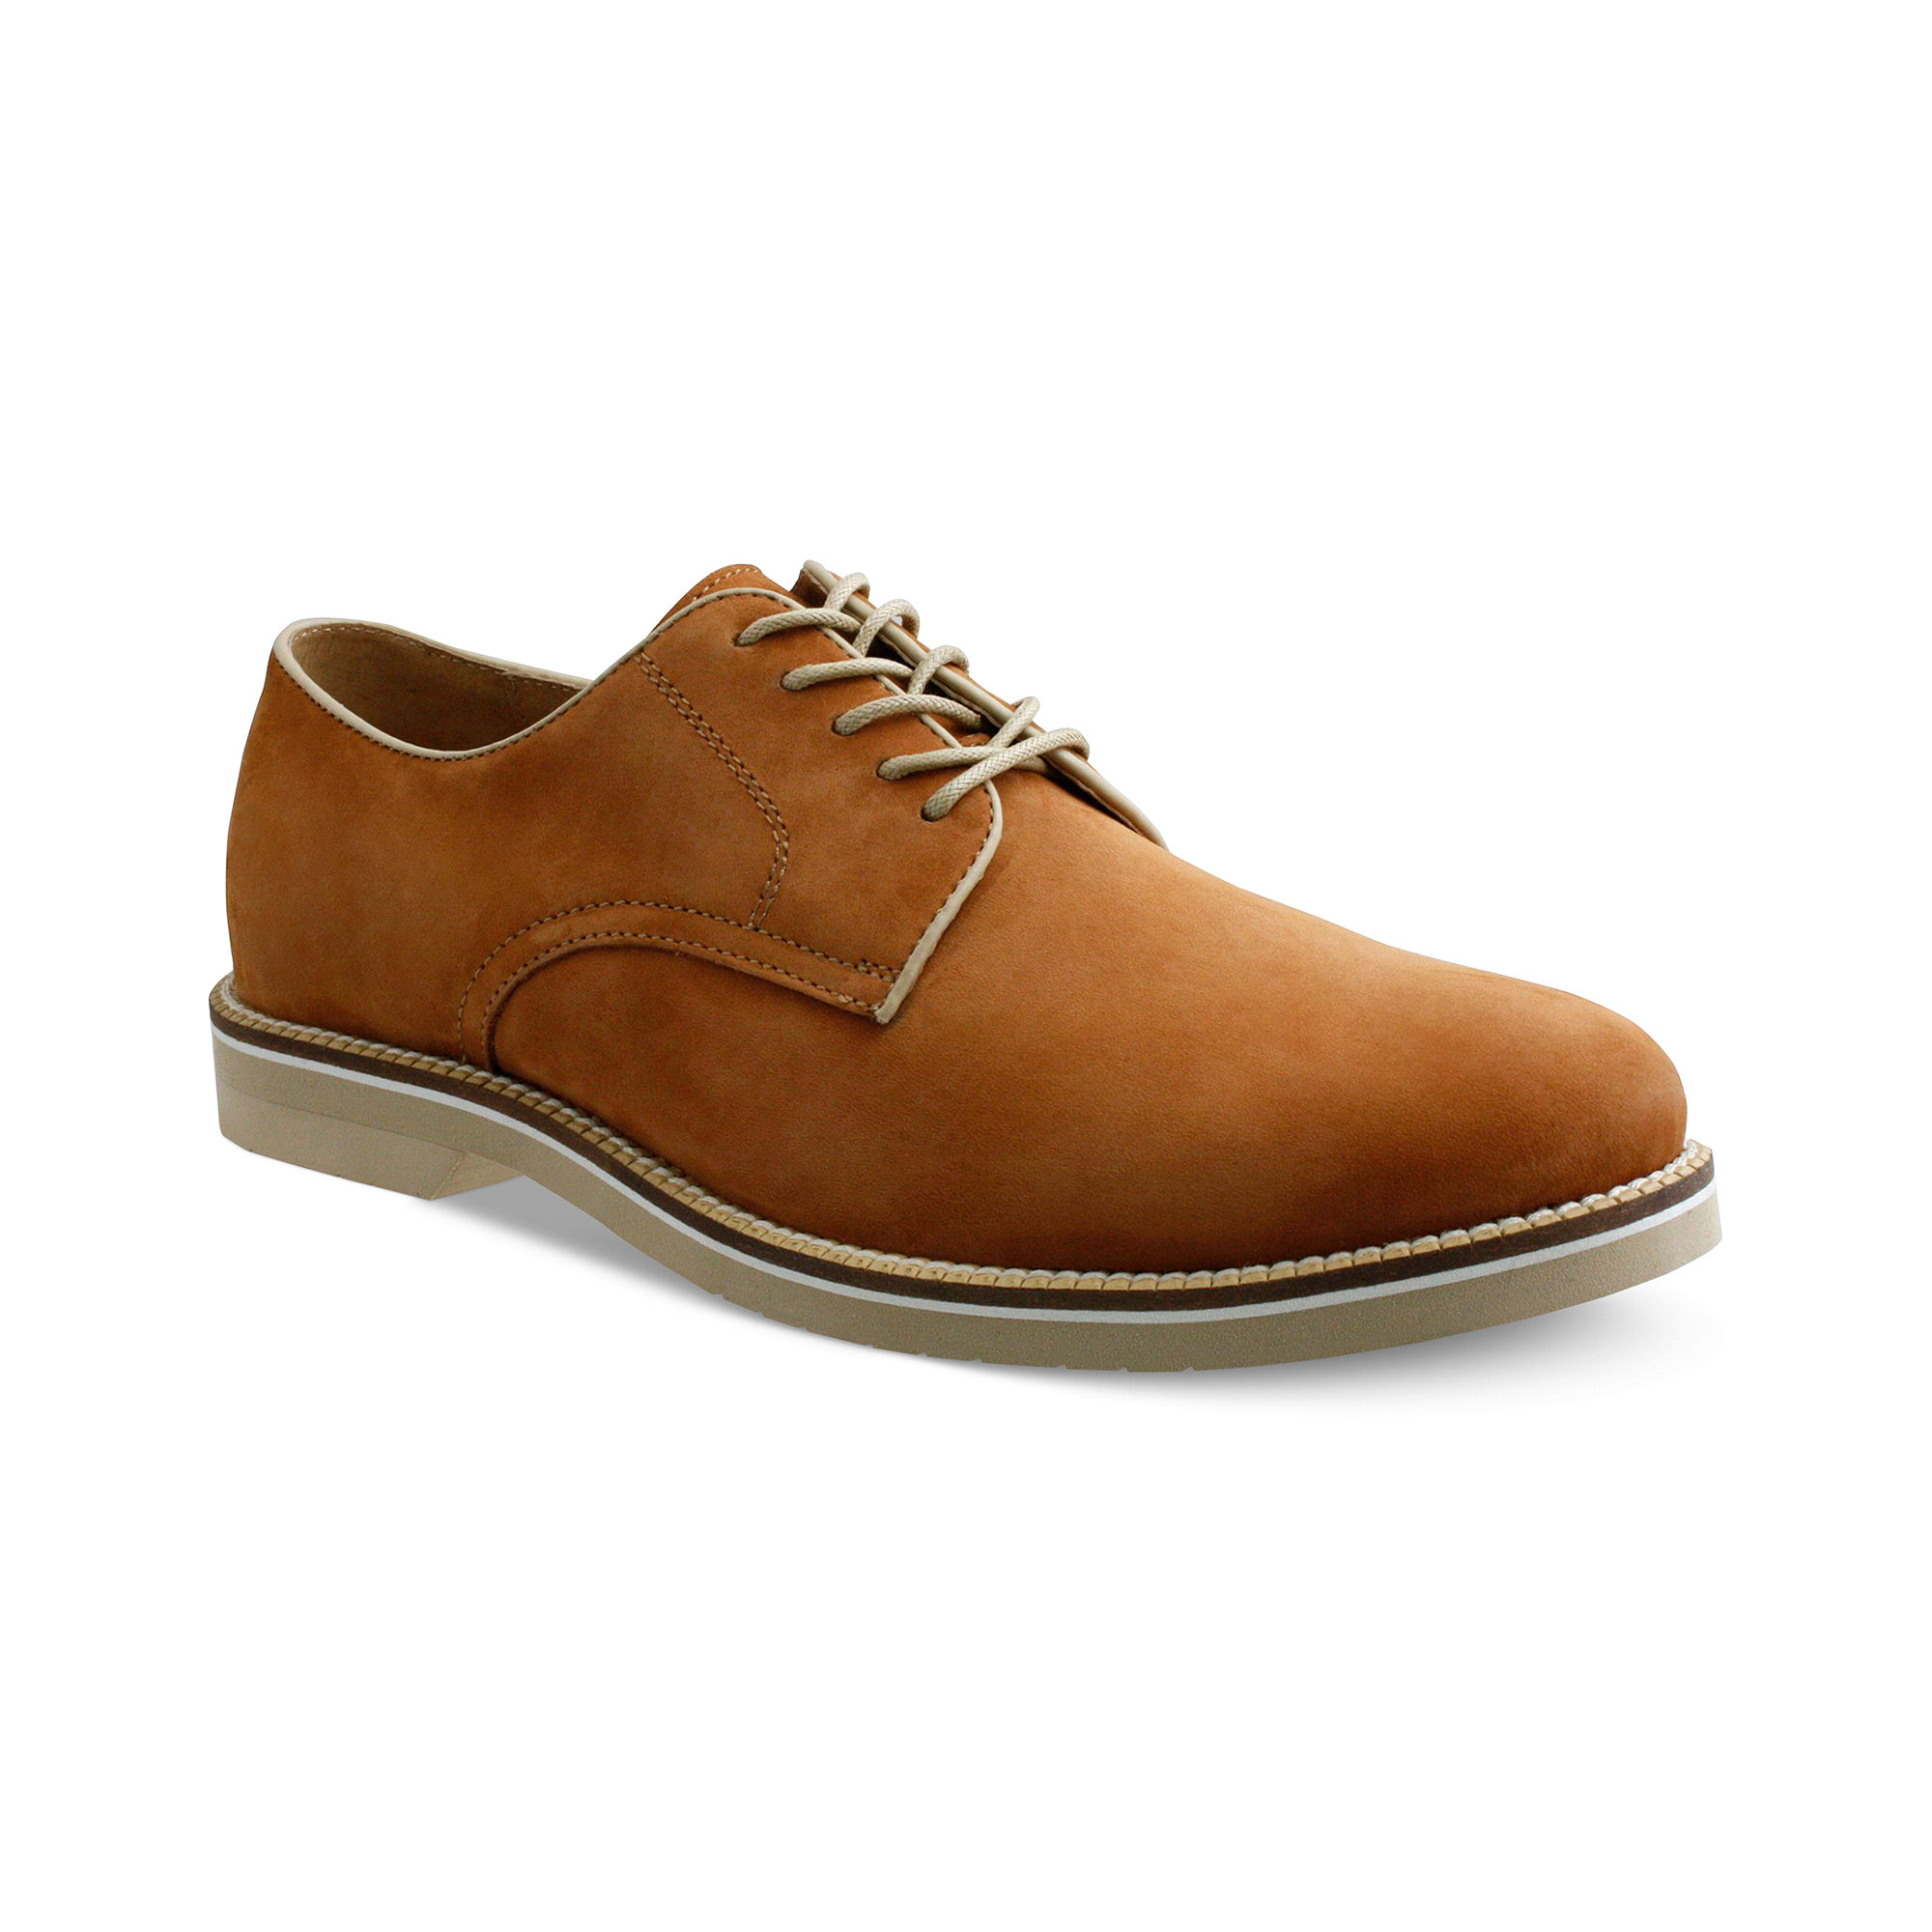 g h bass co buckinham plaintoe suede shoes in brown